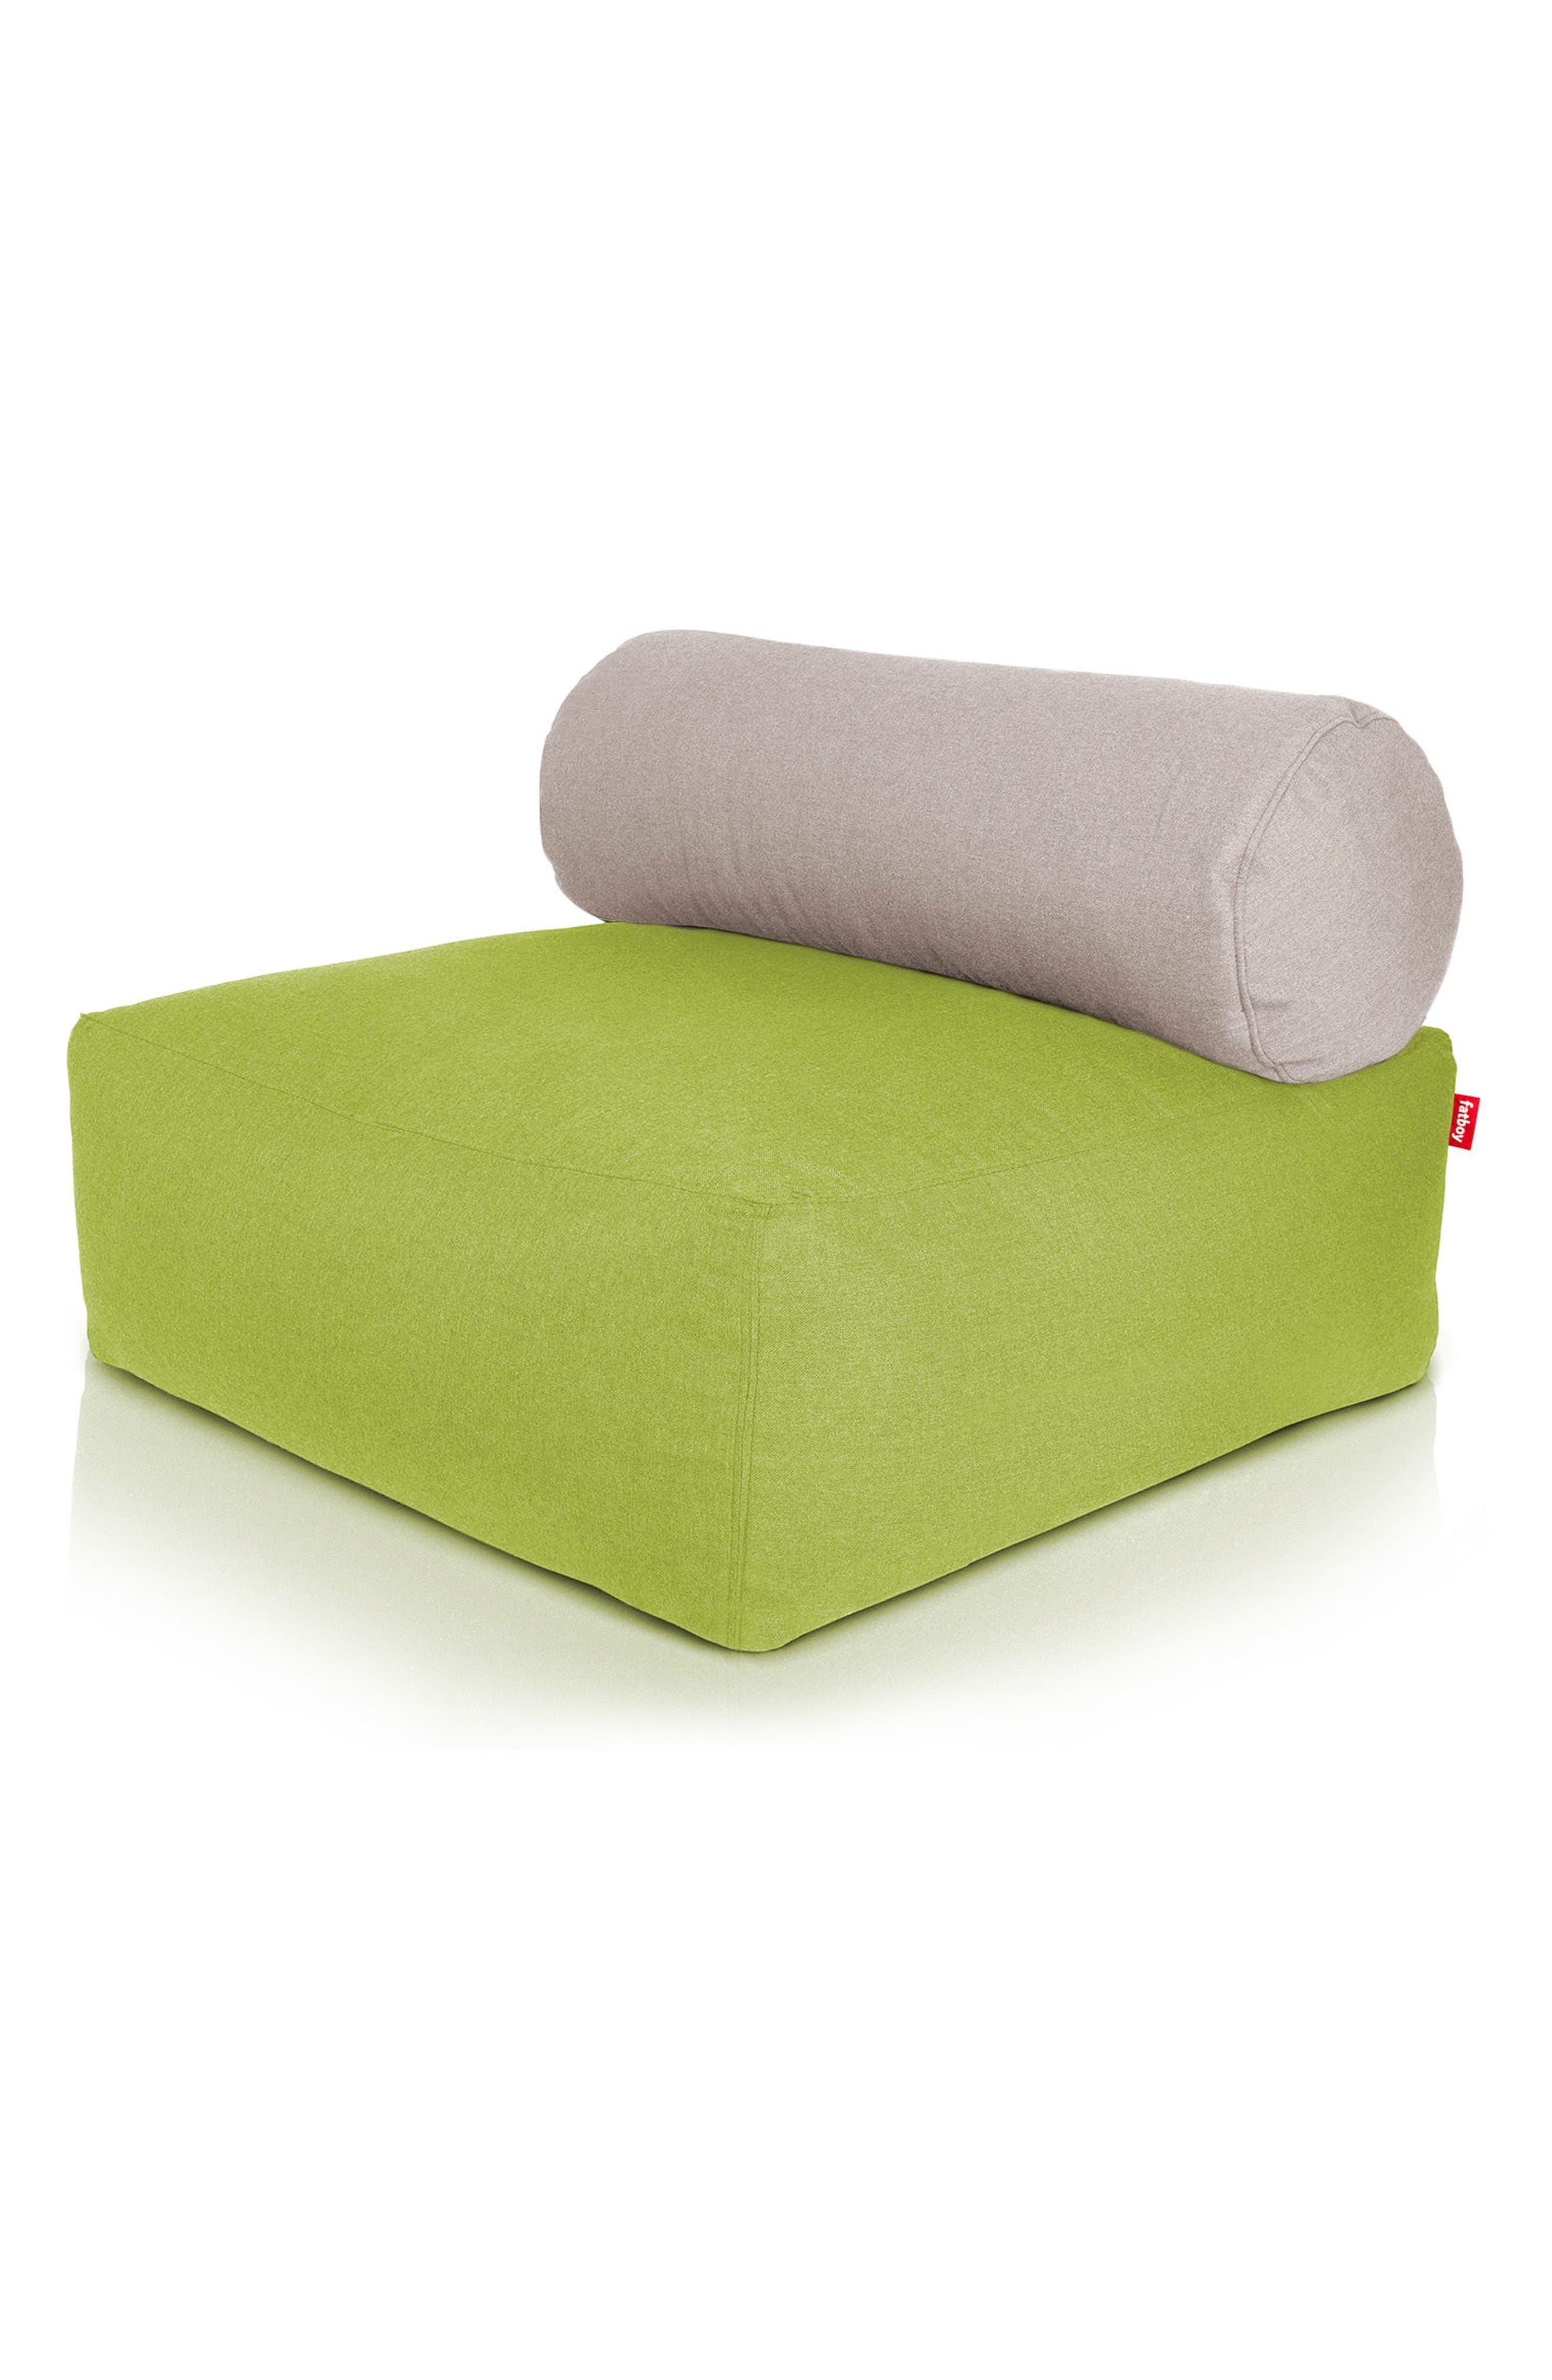 Tsjonge Lounge Seat,                         Main,                         color, Green / Light Grey